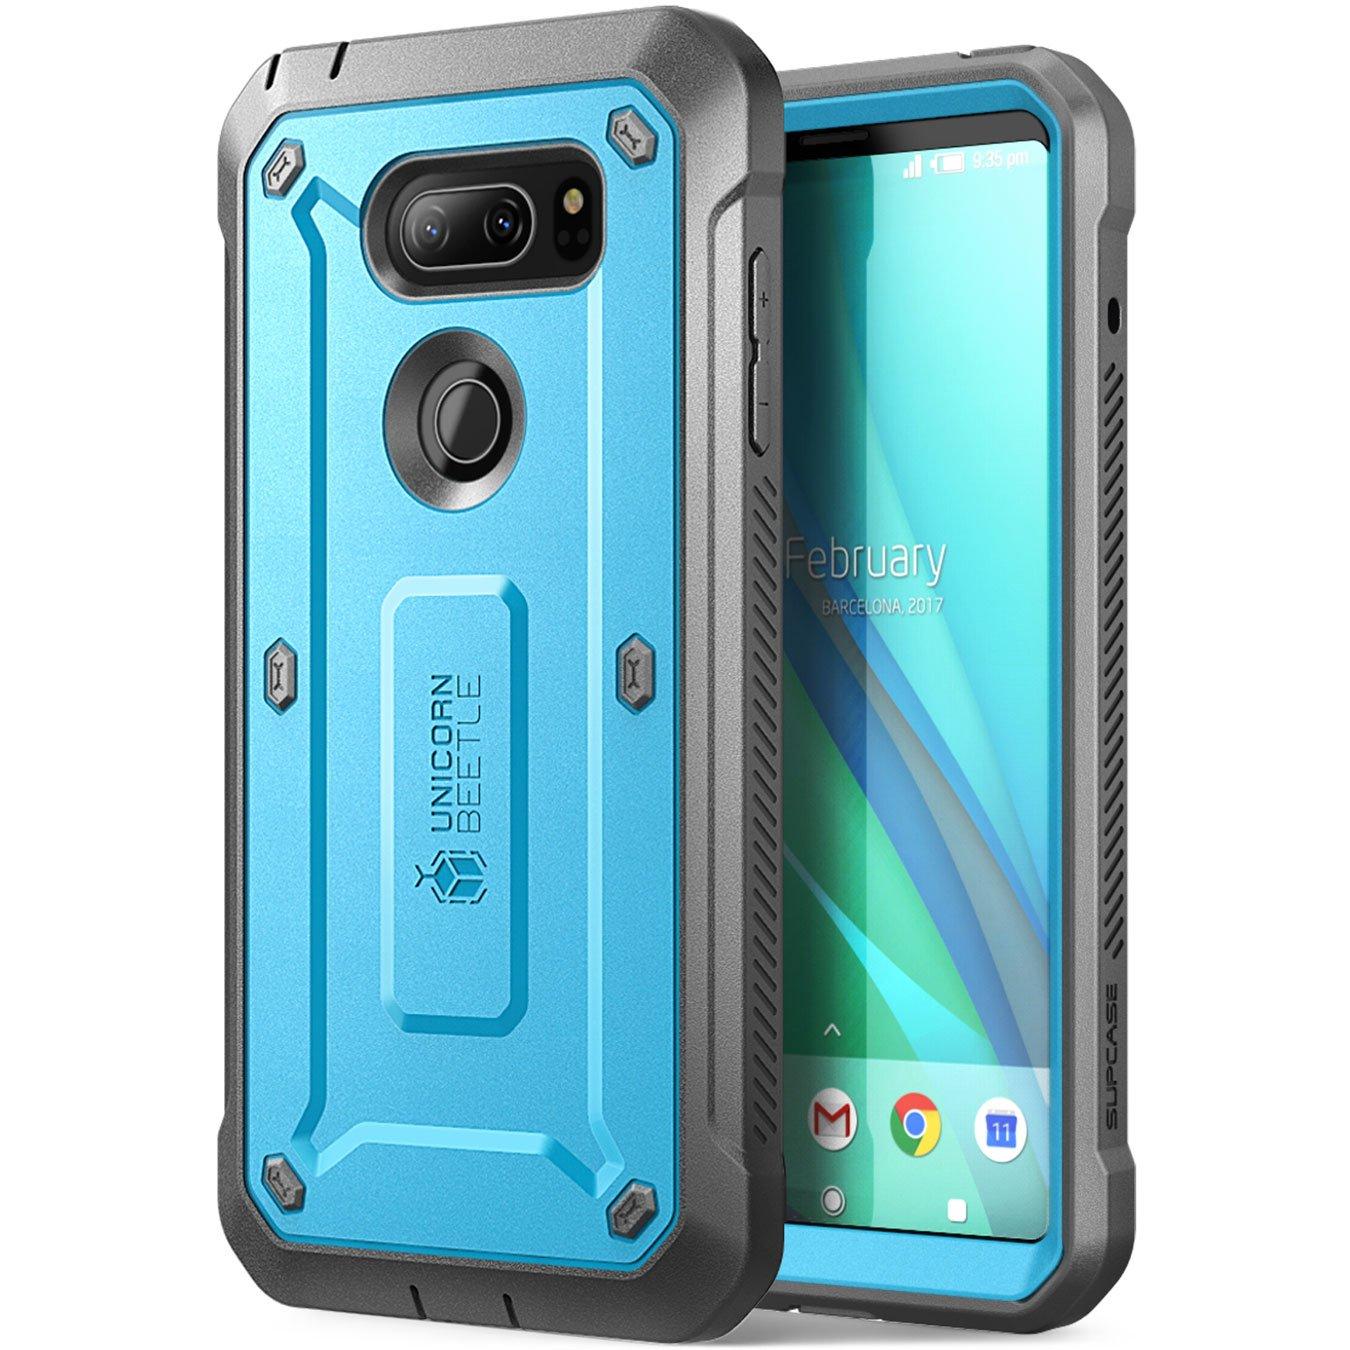 LG V30 Case, SUPCASE Full-body Rugged Holster Case with Built-in Screen Protector for LG V30, LG V30s,LG V35,LG V35 ThinQ,LG V30 Plus 2017 Release, Unicorn Beetle PRO Series(Blue/Gray) by SUPCASE (Image #1)